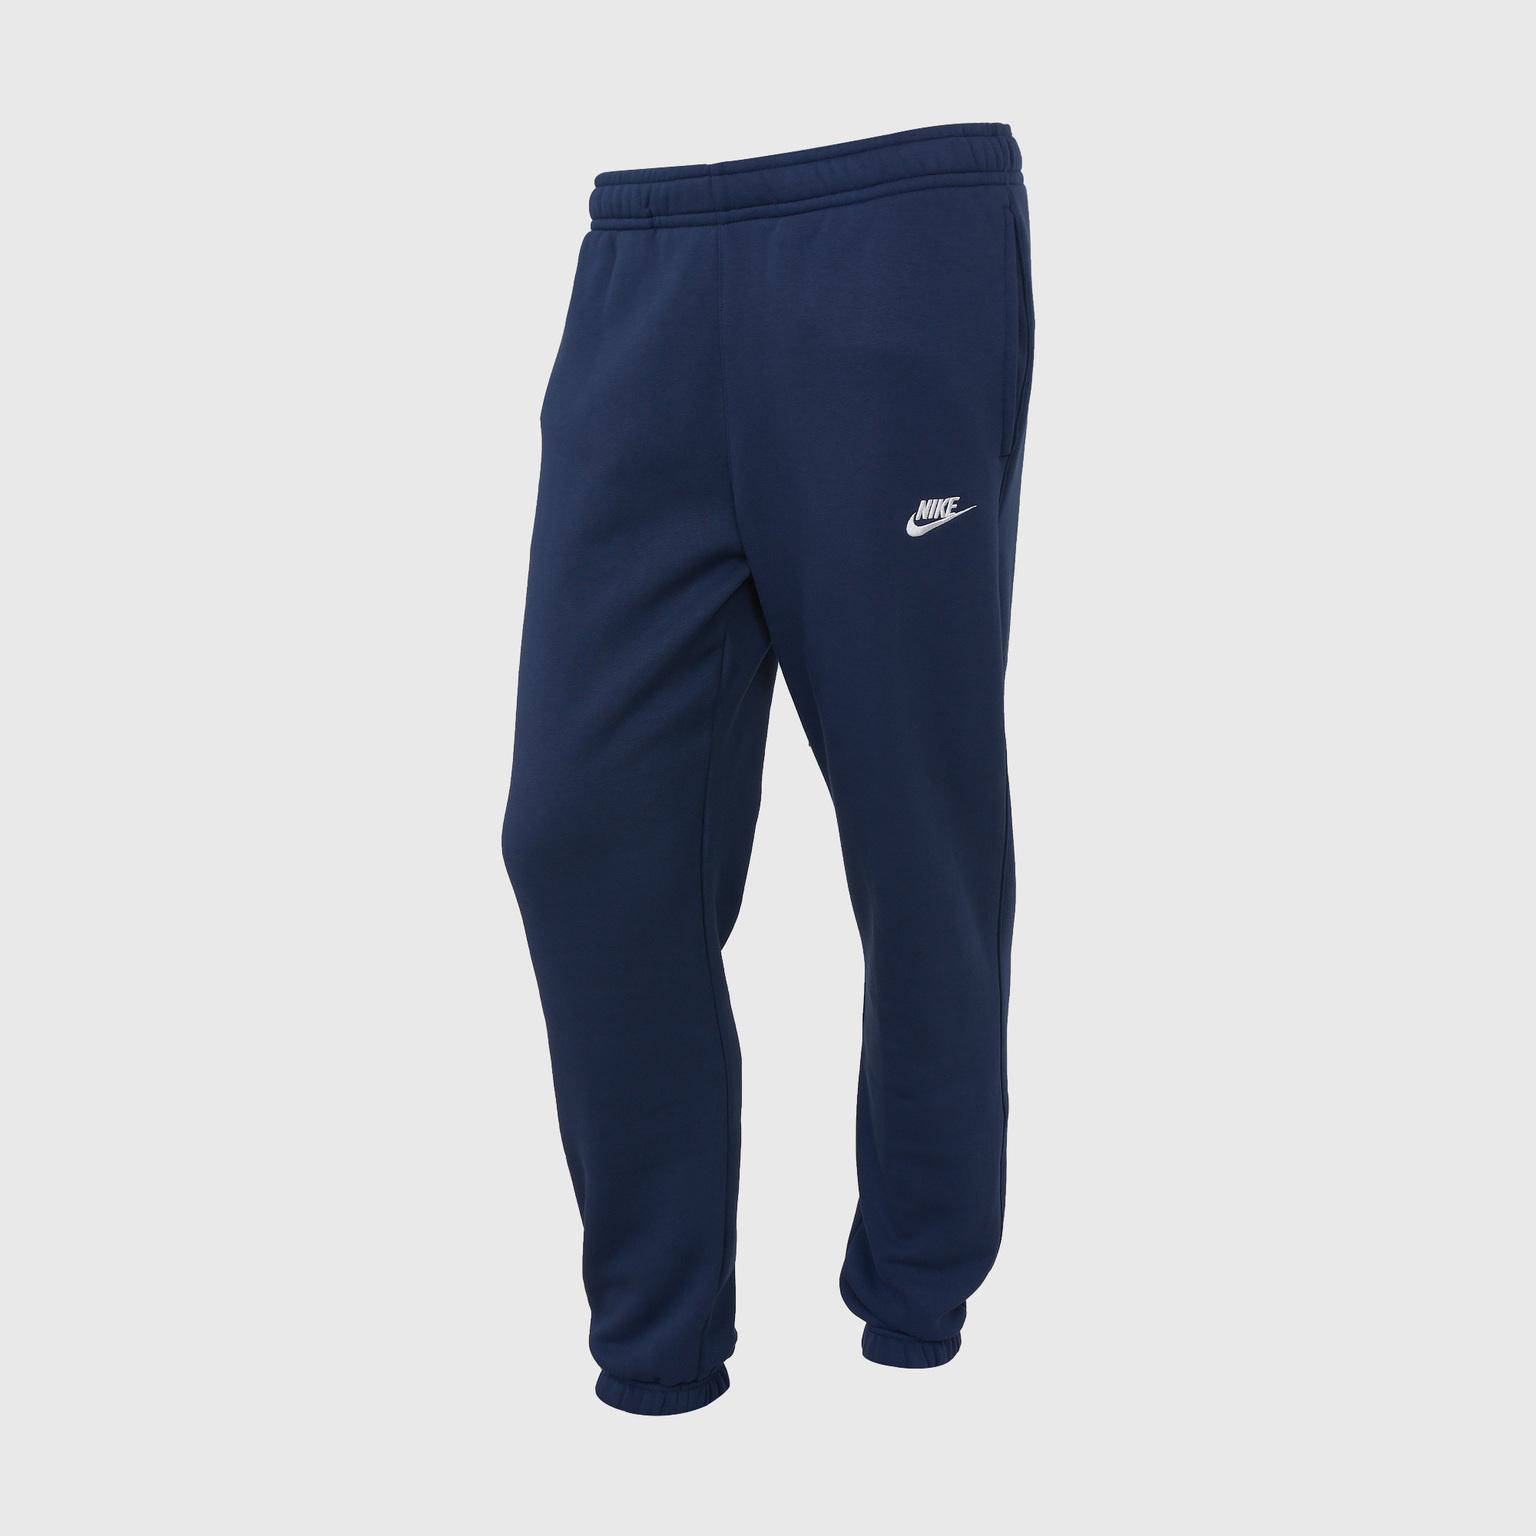 Брюки Nike Club Pant BV2737-410 цена